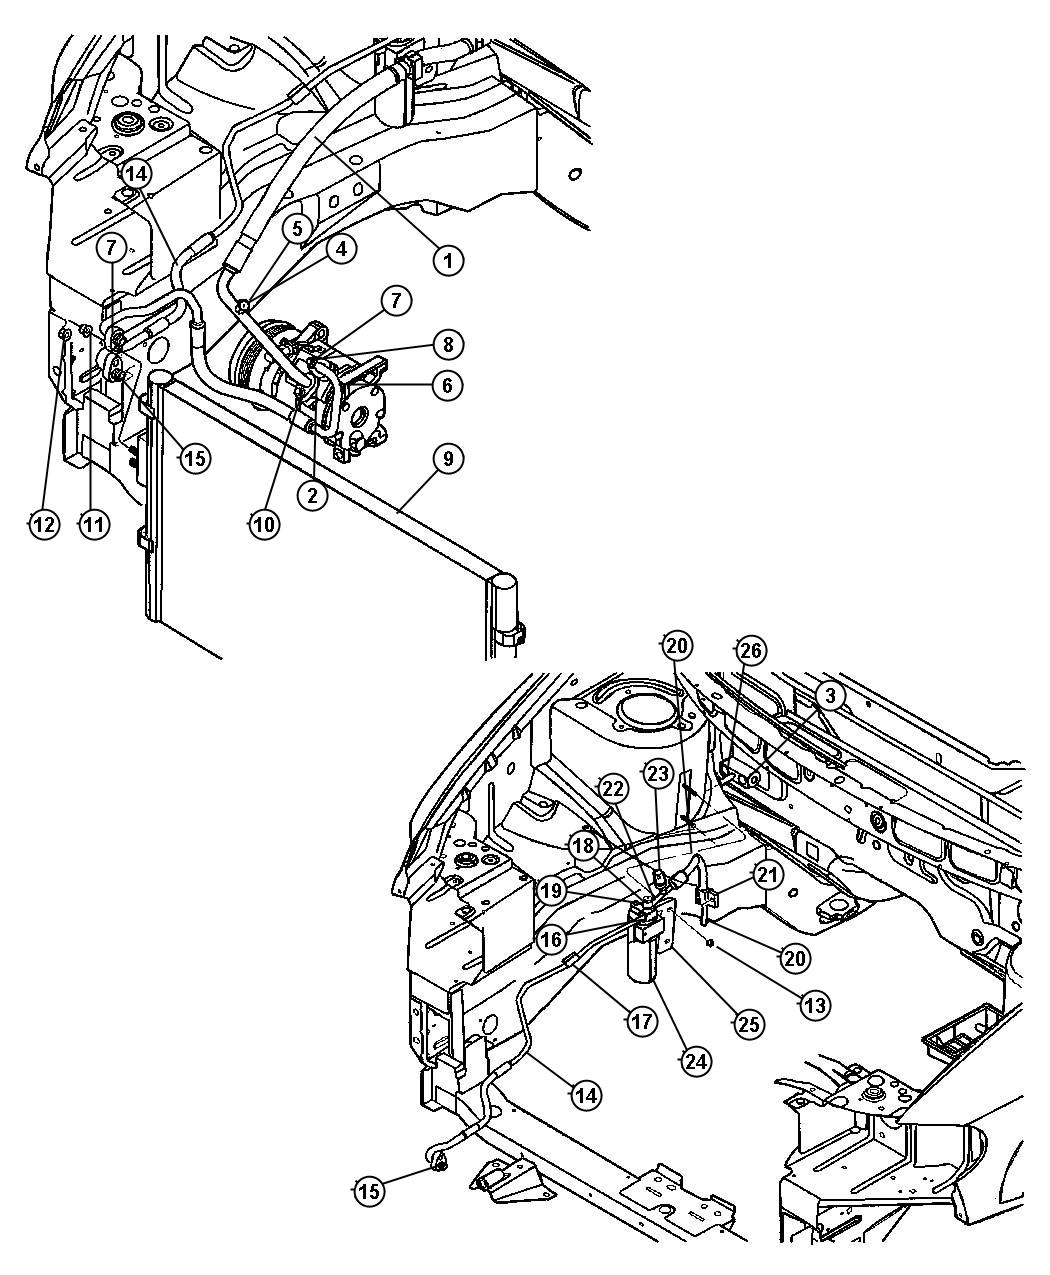 2000 dodge caravan belt diagram electronic ignition wiring 2009 avenger serpentine get free